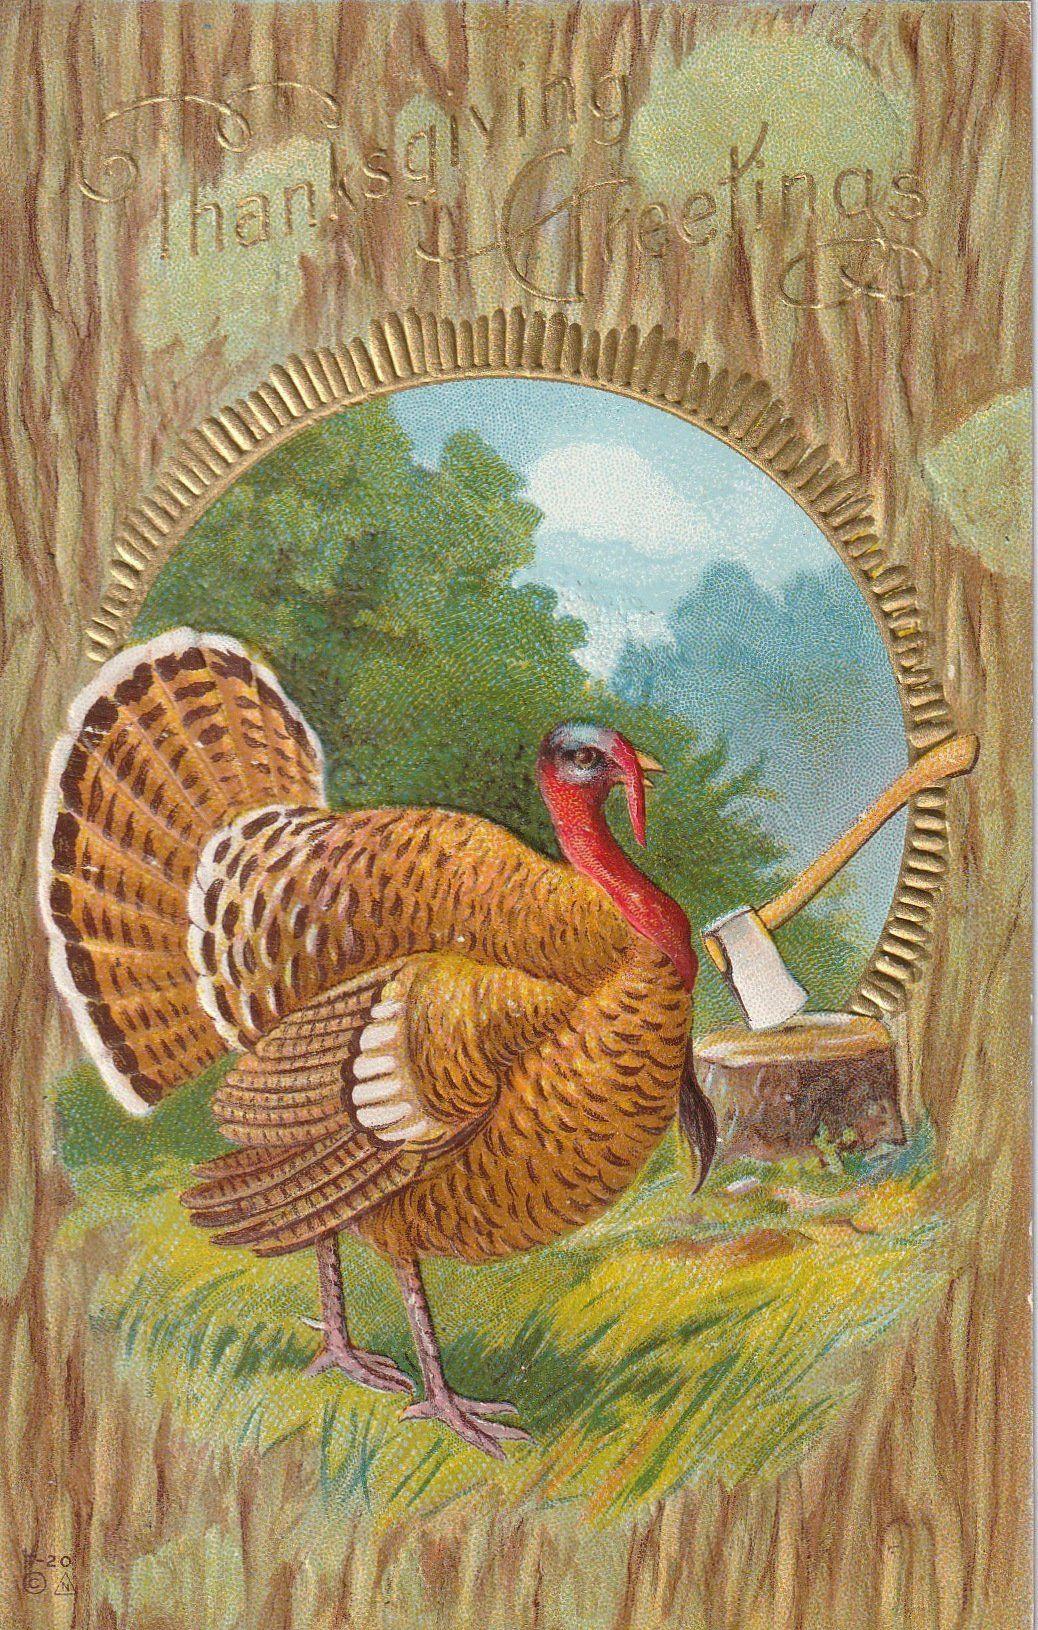 Thanksgiving 2019 Turkey  Fat Thanksgiving Turkey E Nash Postcard c 1900s en